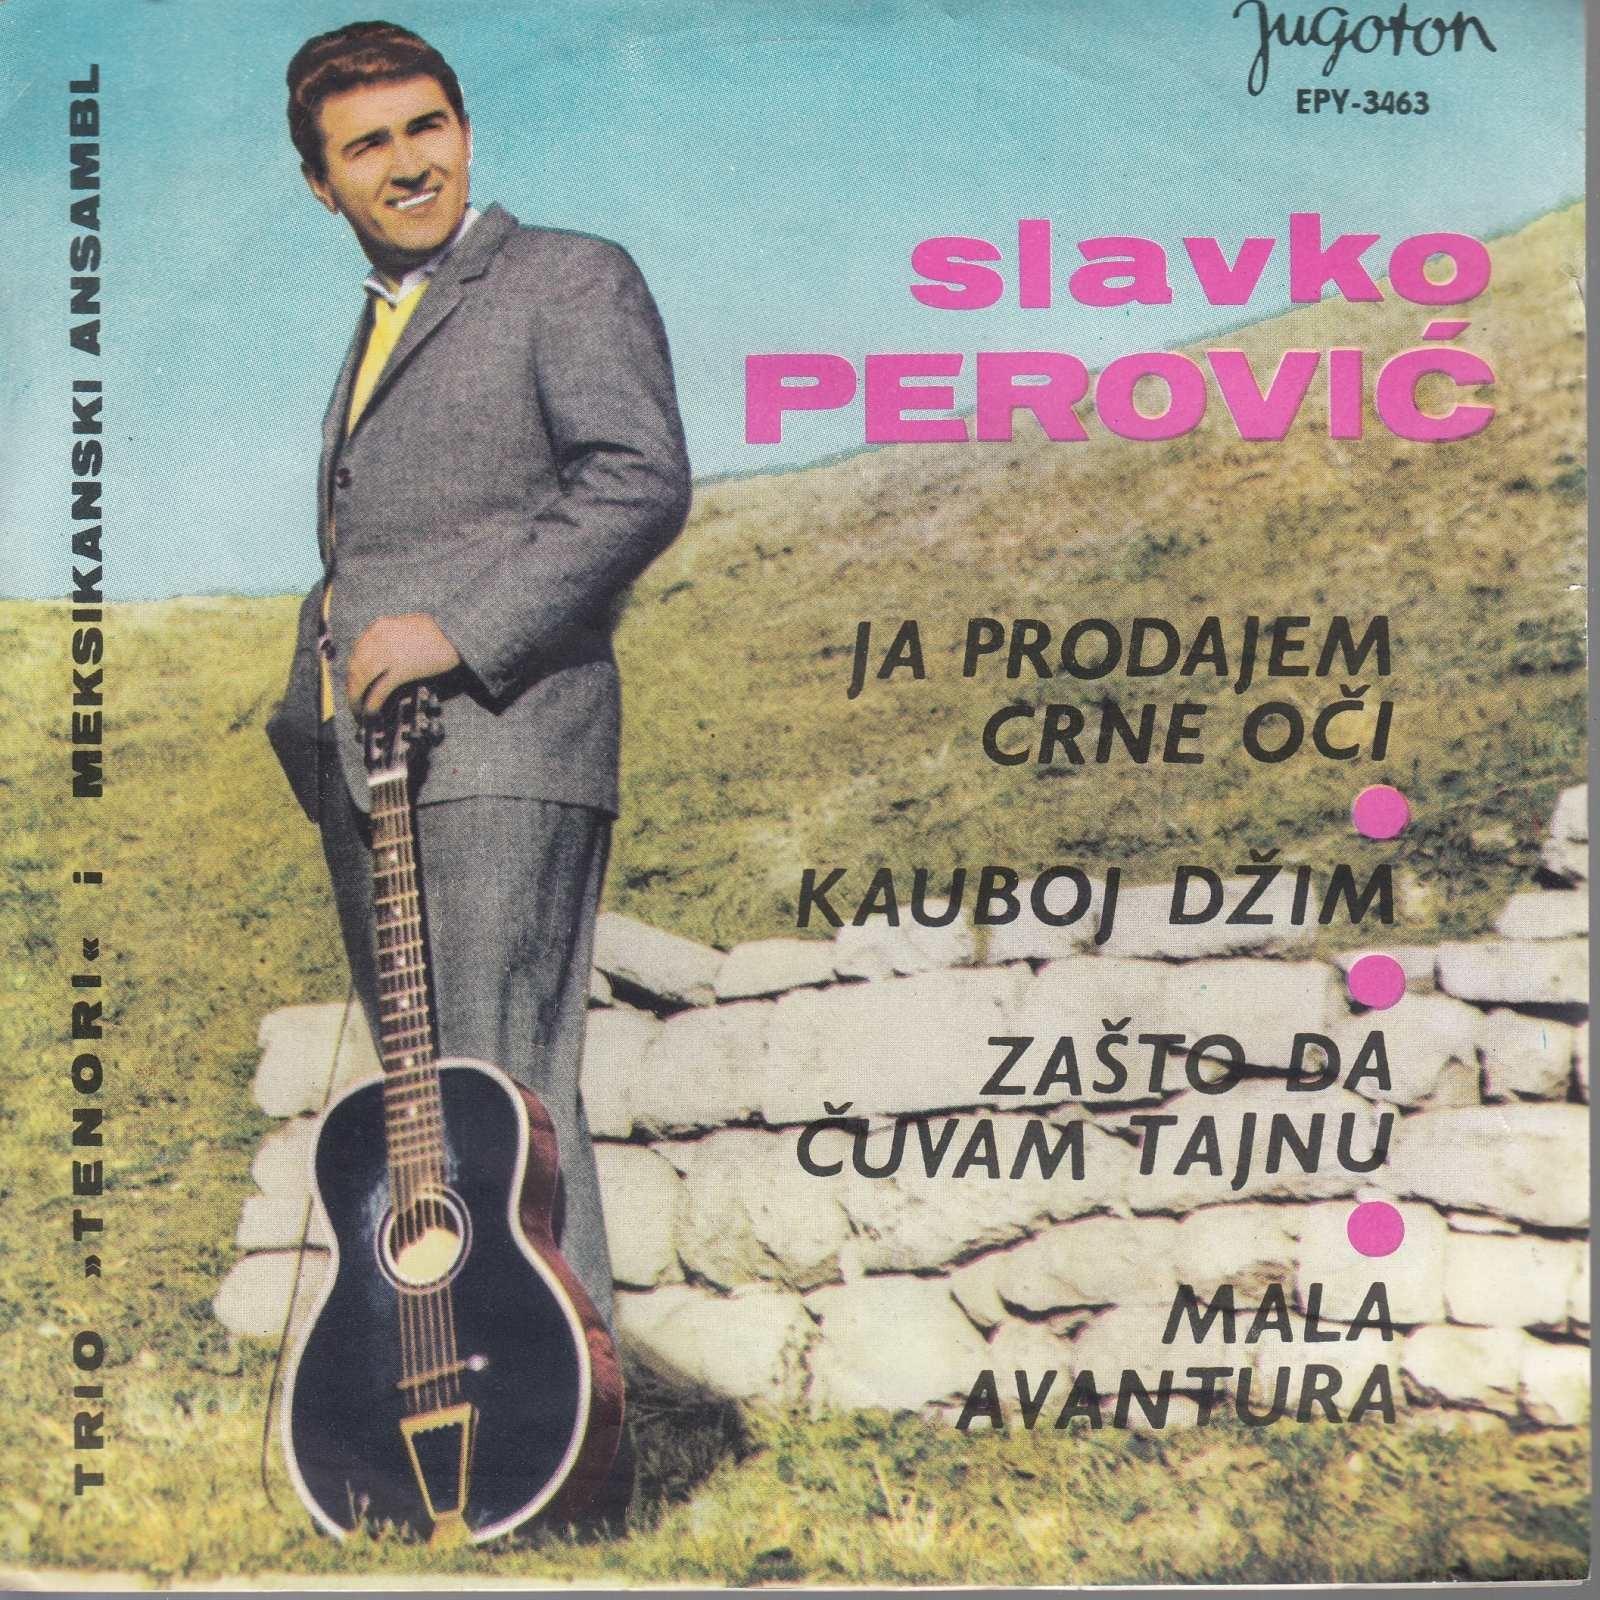 Perovic Slavko - Ja Prodajem Crne Oci/kauboj Dzim/zasto Da Cuvam Tajnu/mala Avantura